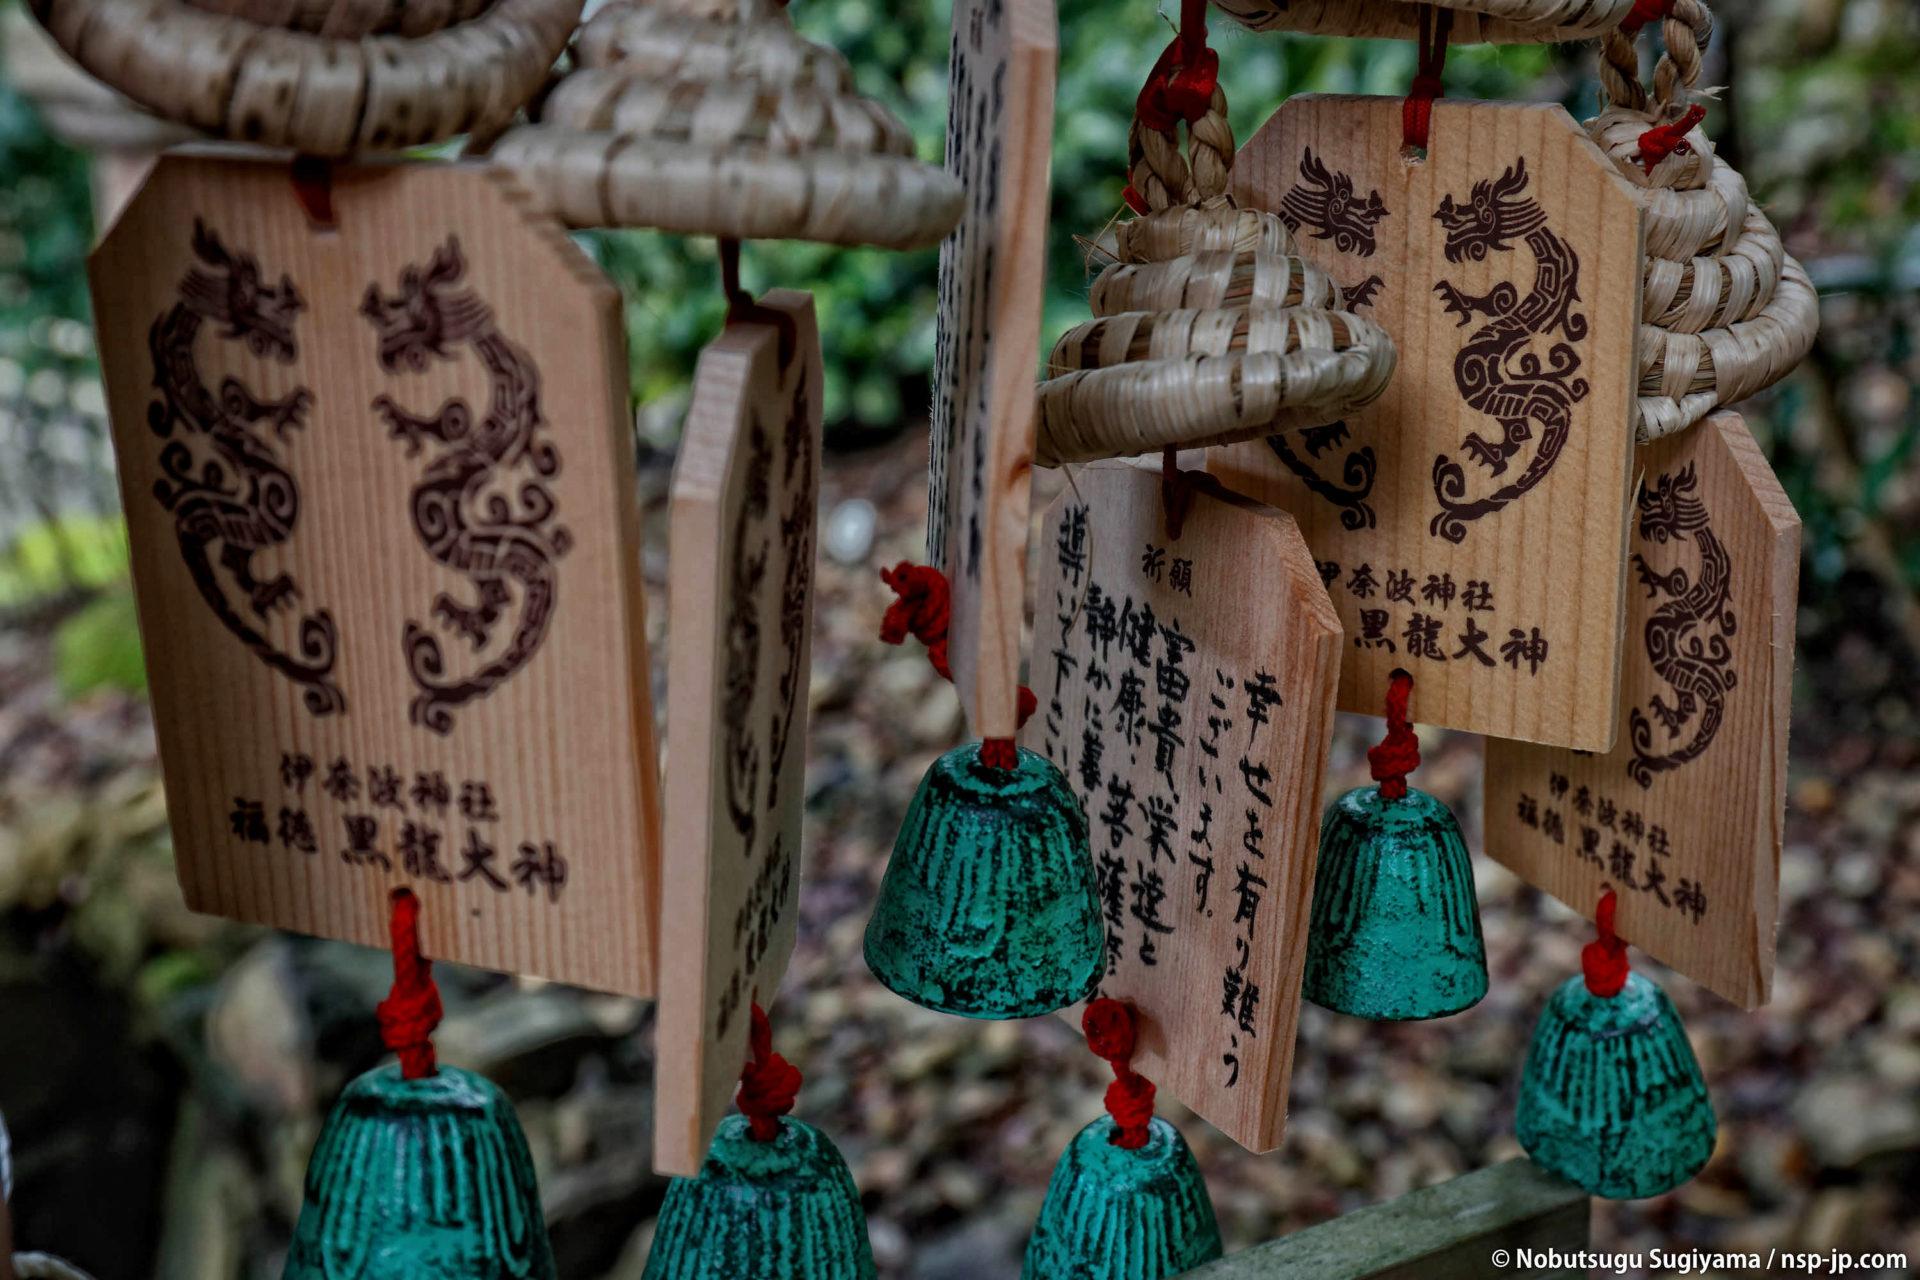 伊奈波神社-黒龍社-絵馬かけ | 岐阜 故郷巡礼 by 杉山宣嗣